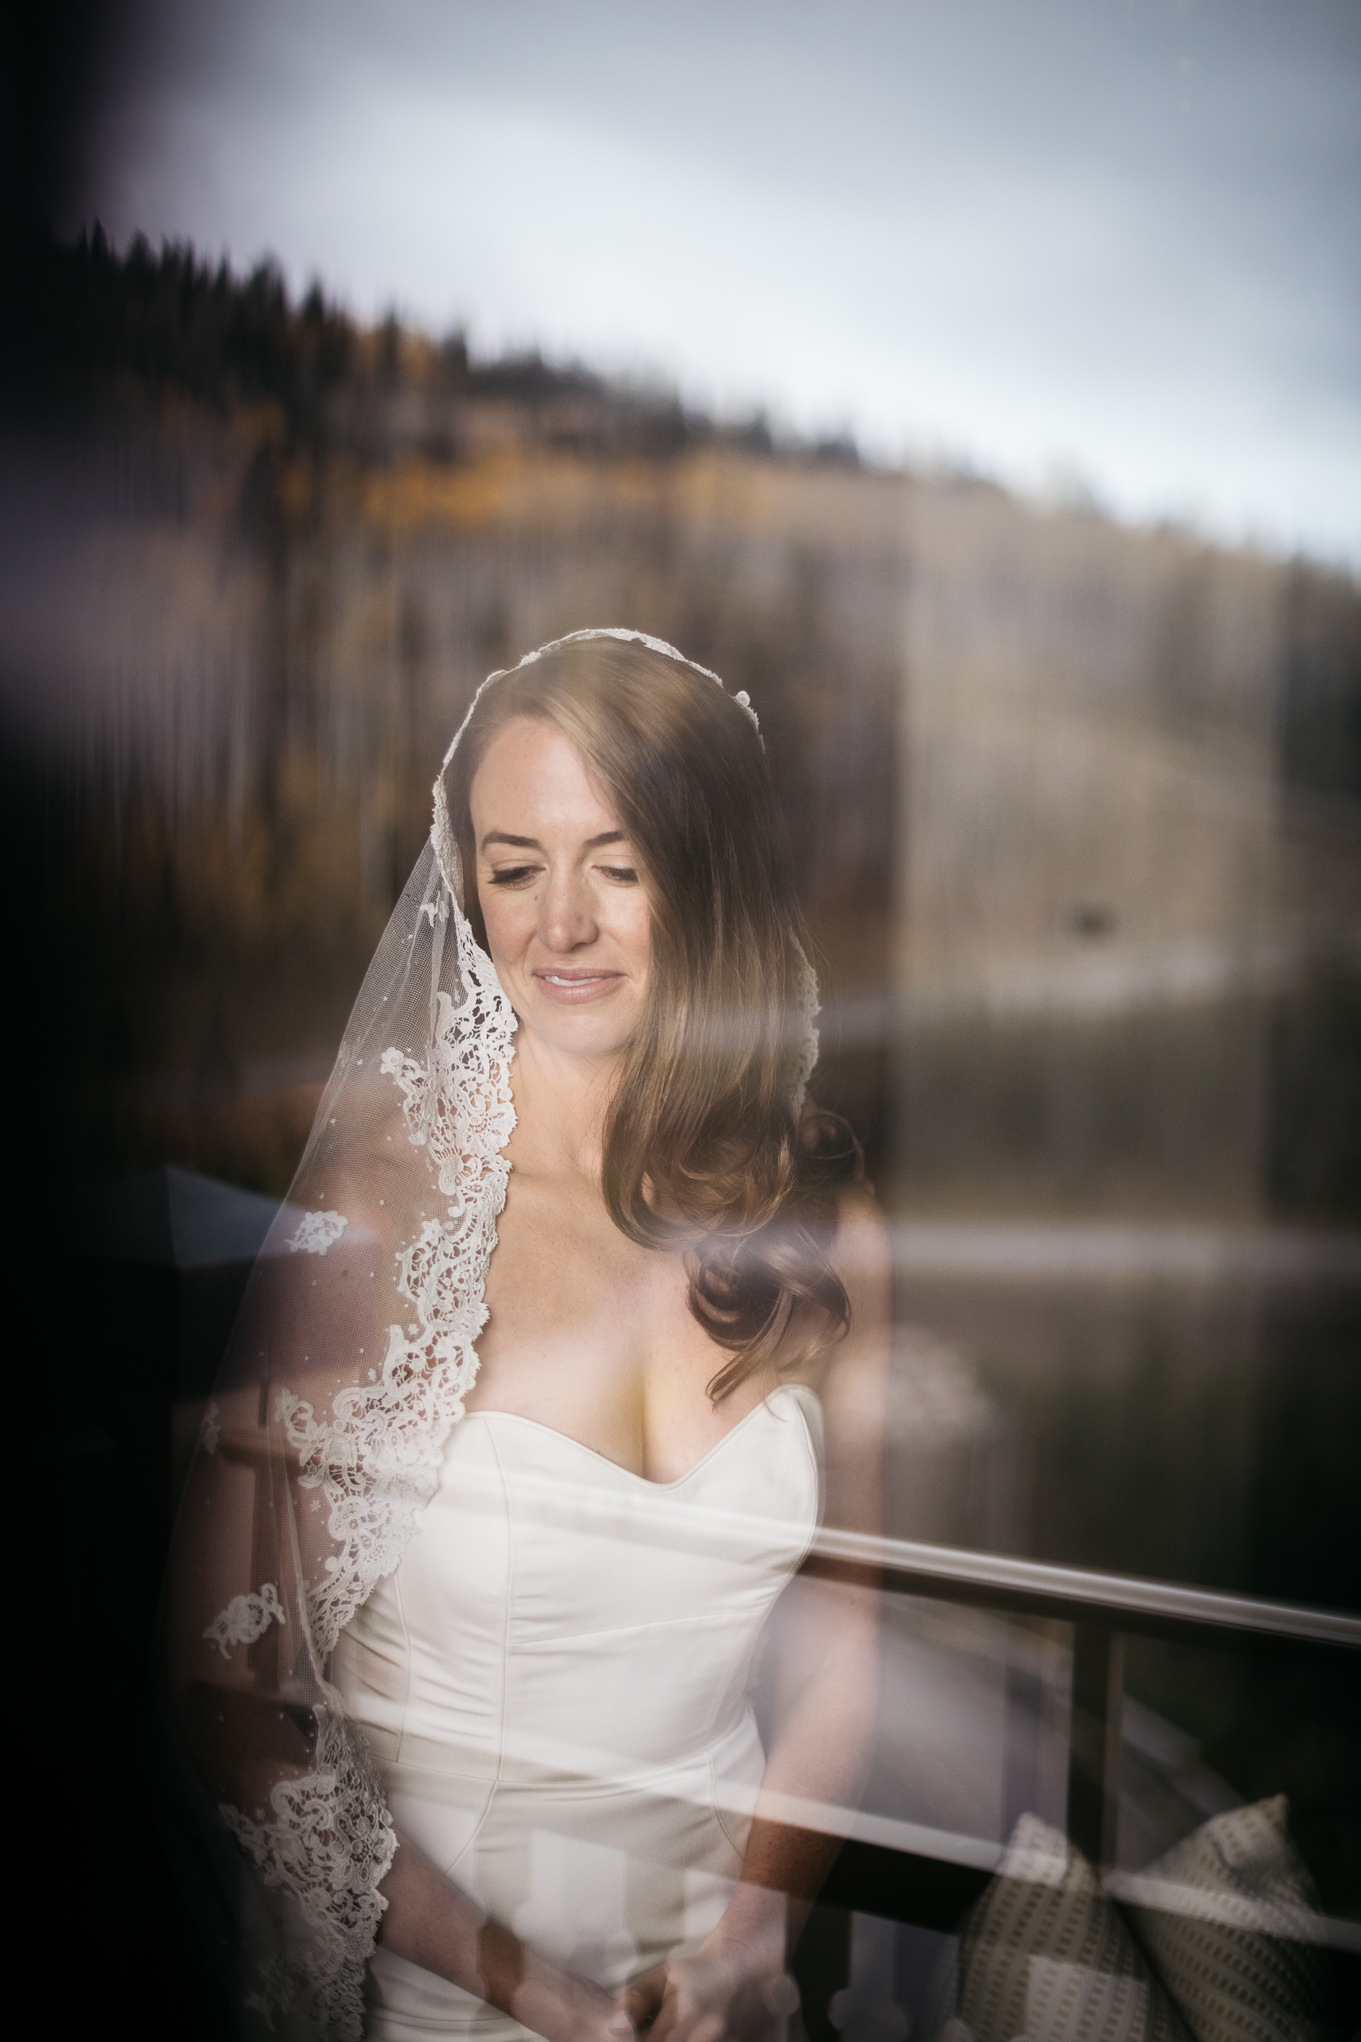 346_ONL_Mairin_Brian_Wedding_Trevor_Hooper_Photo.jpg